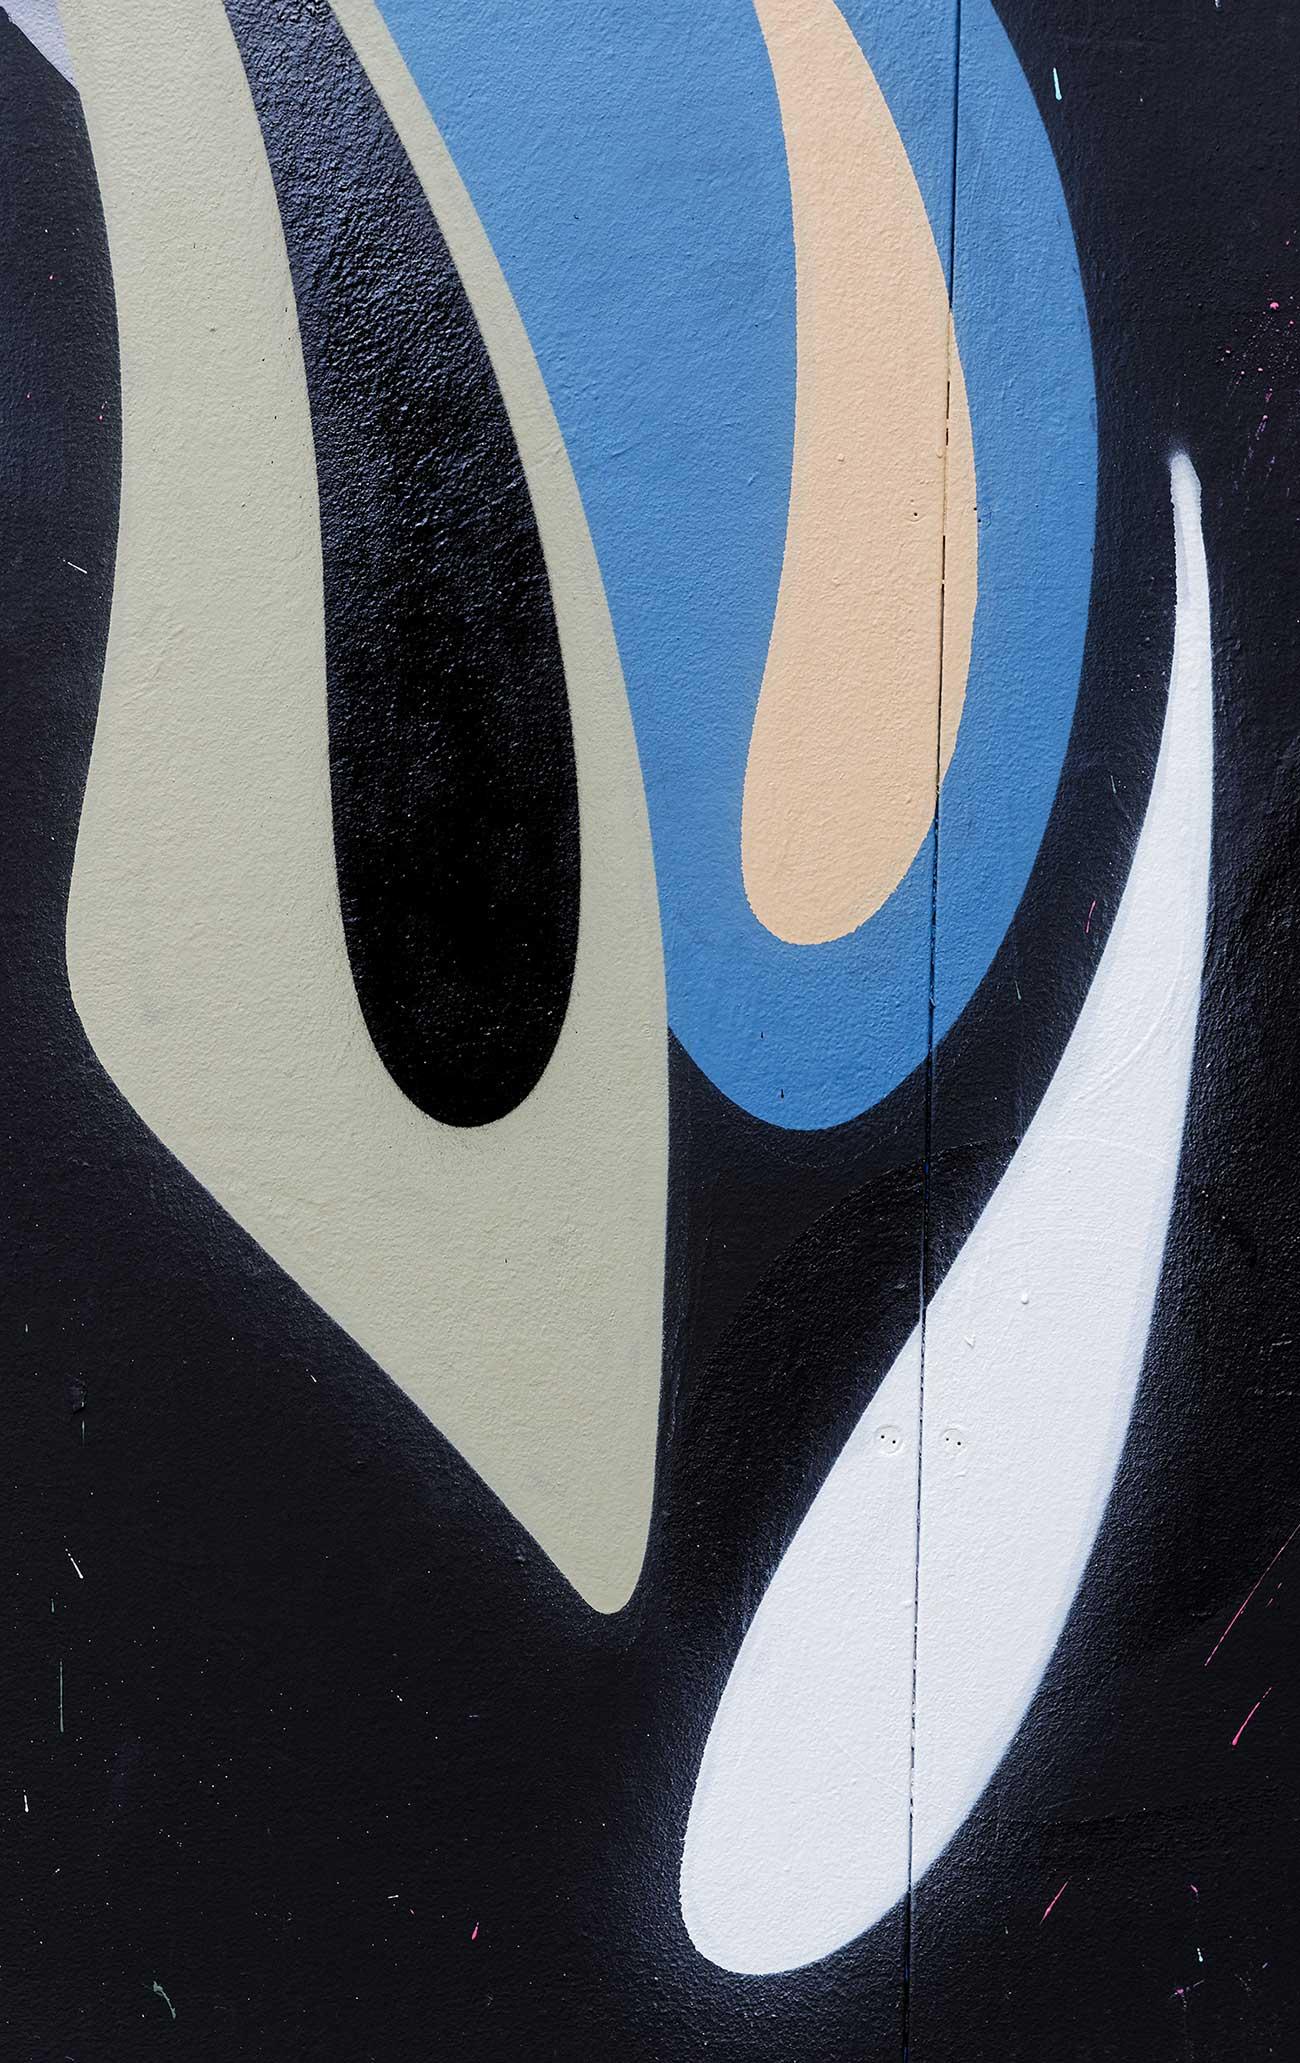 Leyto-detail mur de rennes